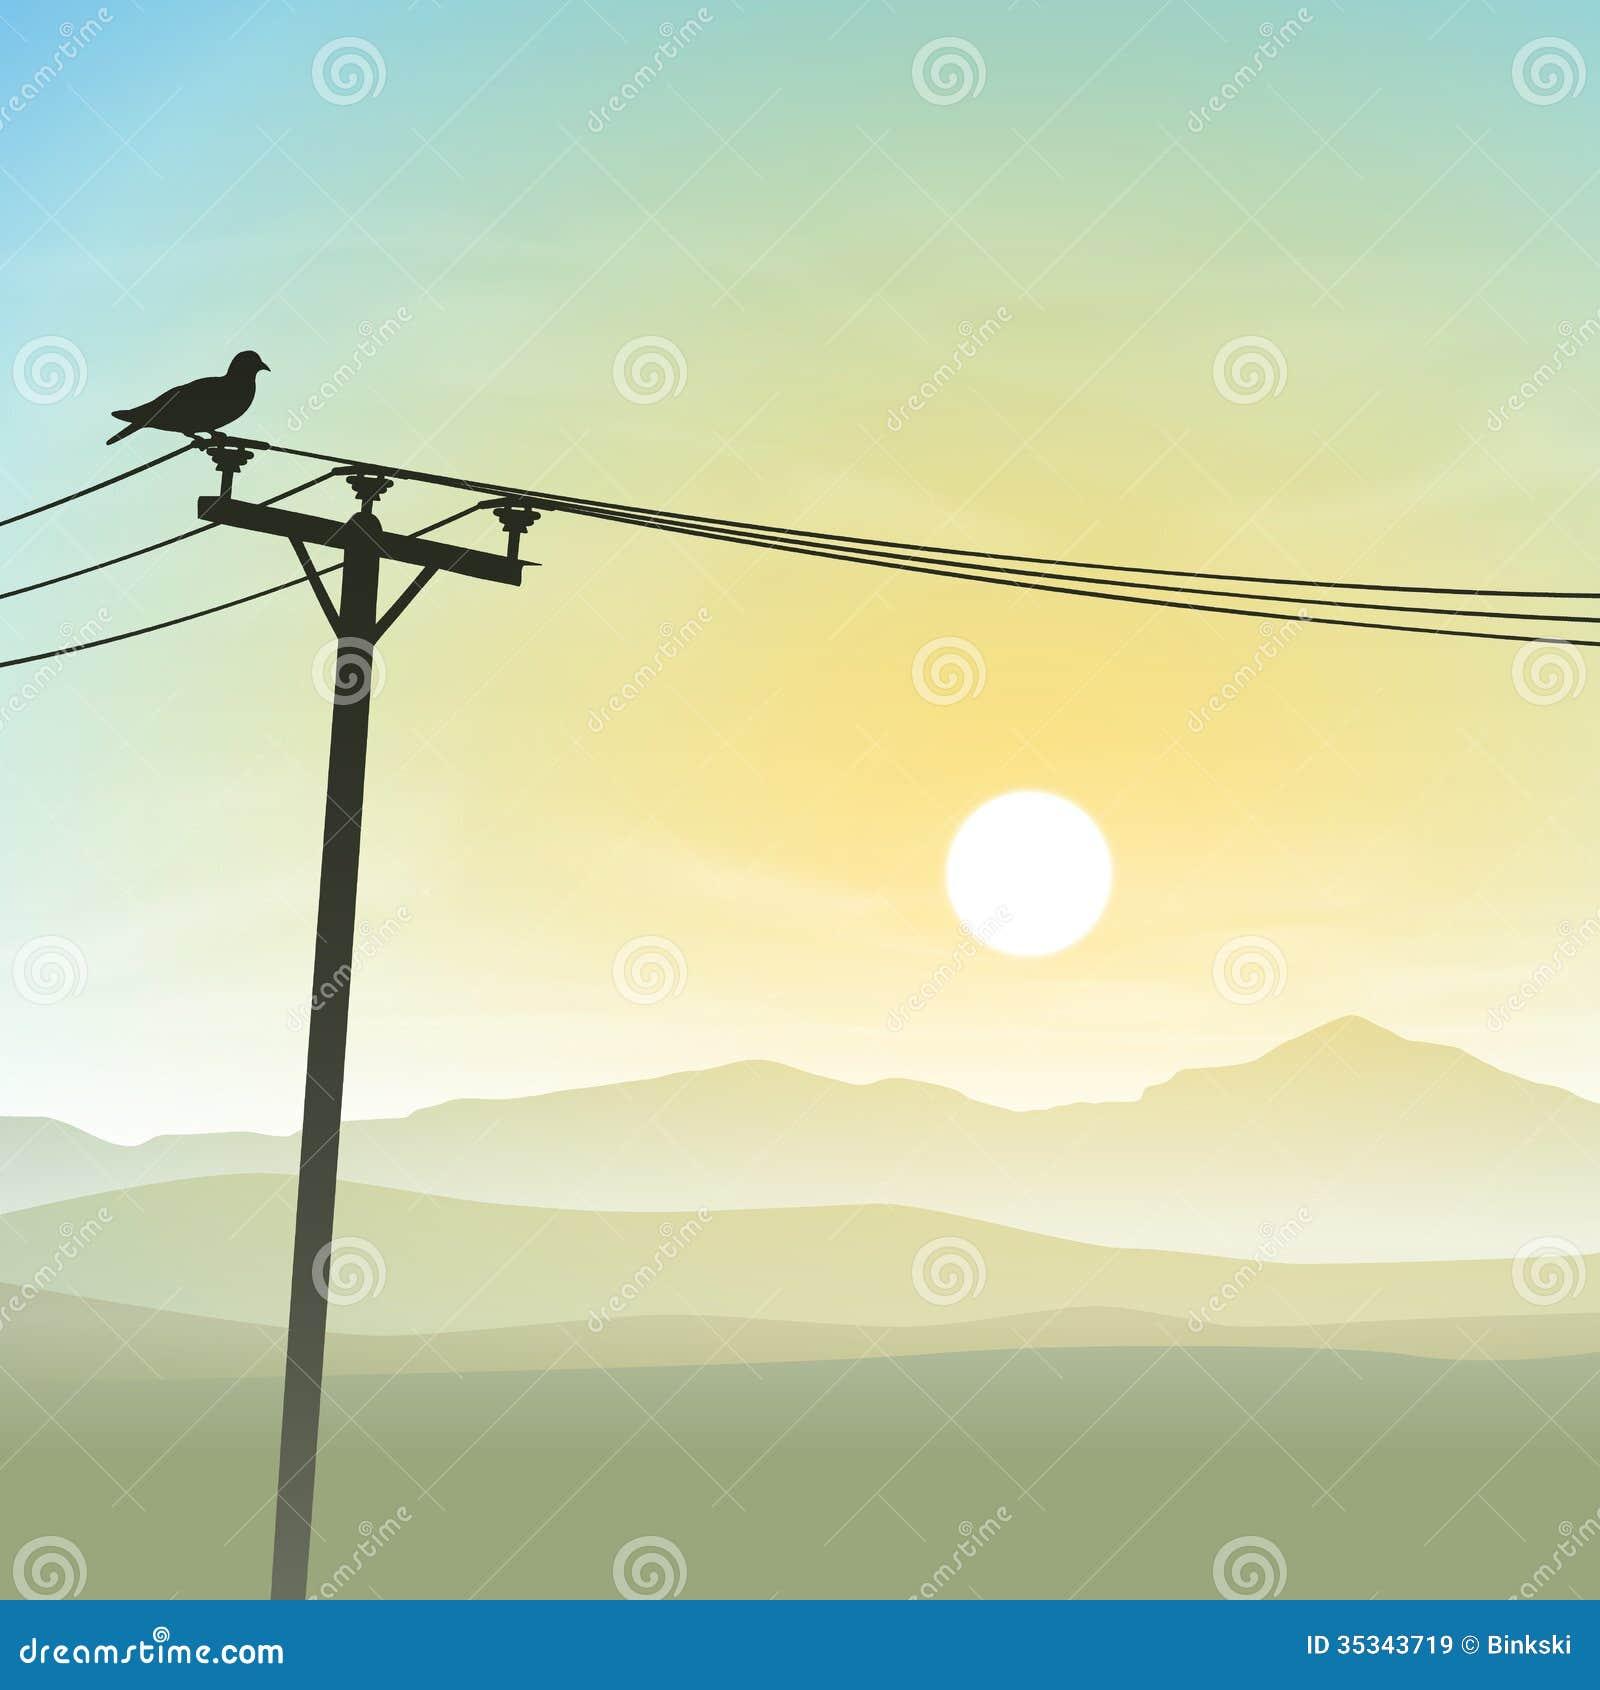 Bird on Telephone Lines stock vector. Illustration of perch - 37438967